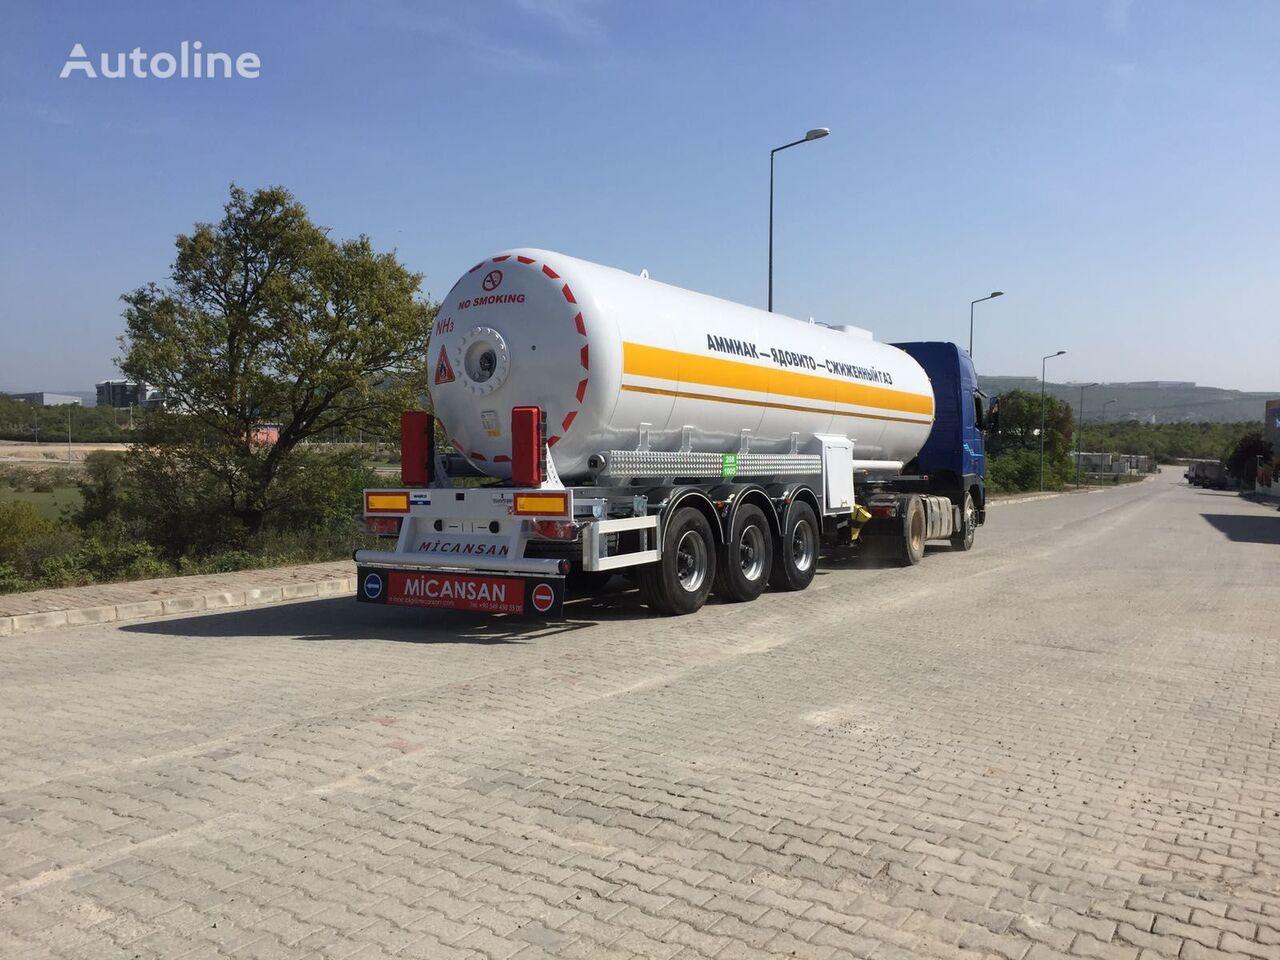 new Micansan LPG GAS TANKS STORAGES AND LPG GAS TRANSPORT TANK SEMI TRAILERS  gas tank trailer